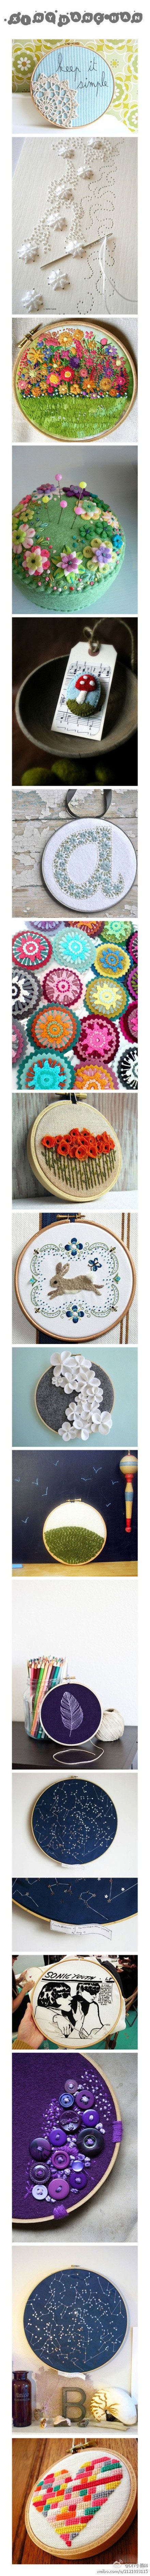 Crafty Ideas / Needle crafts